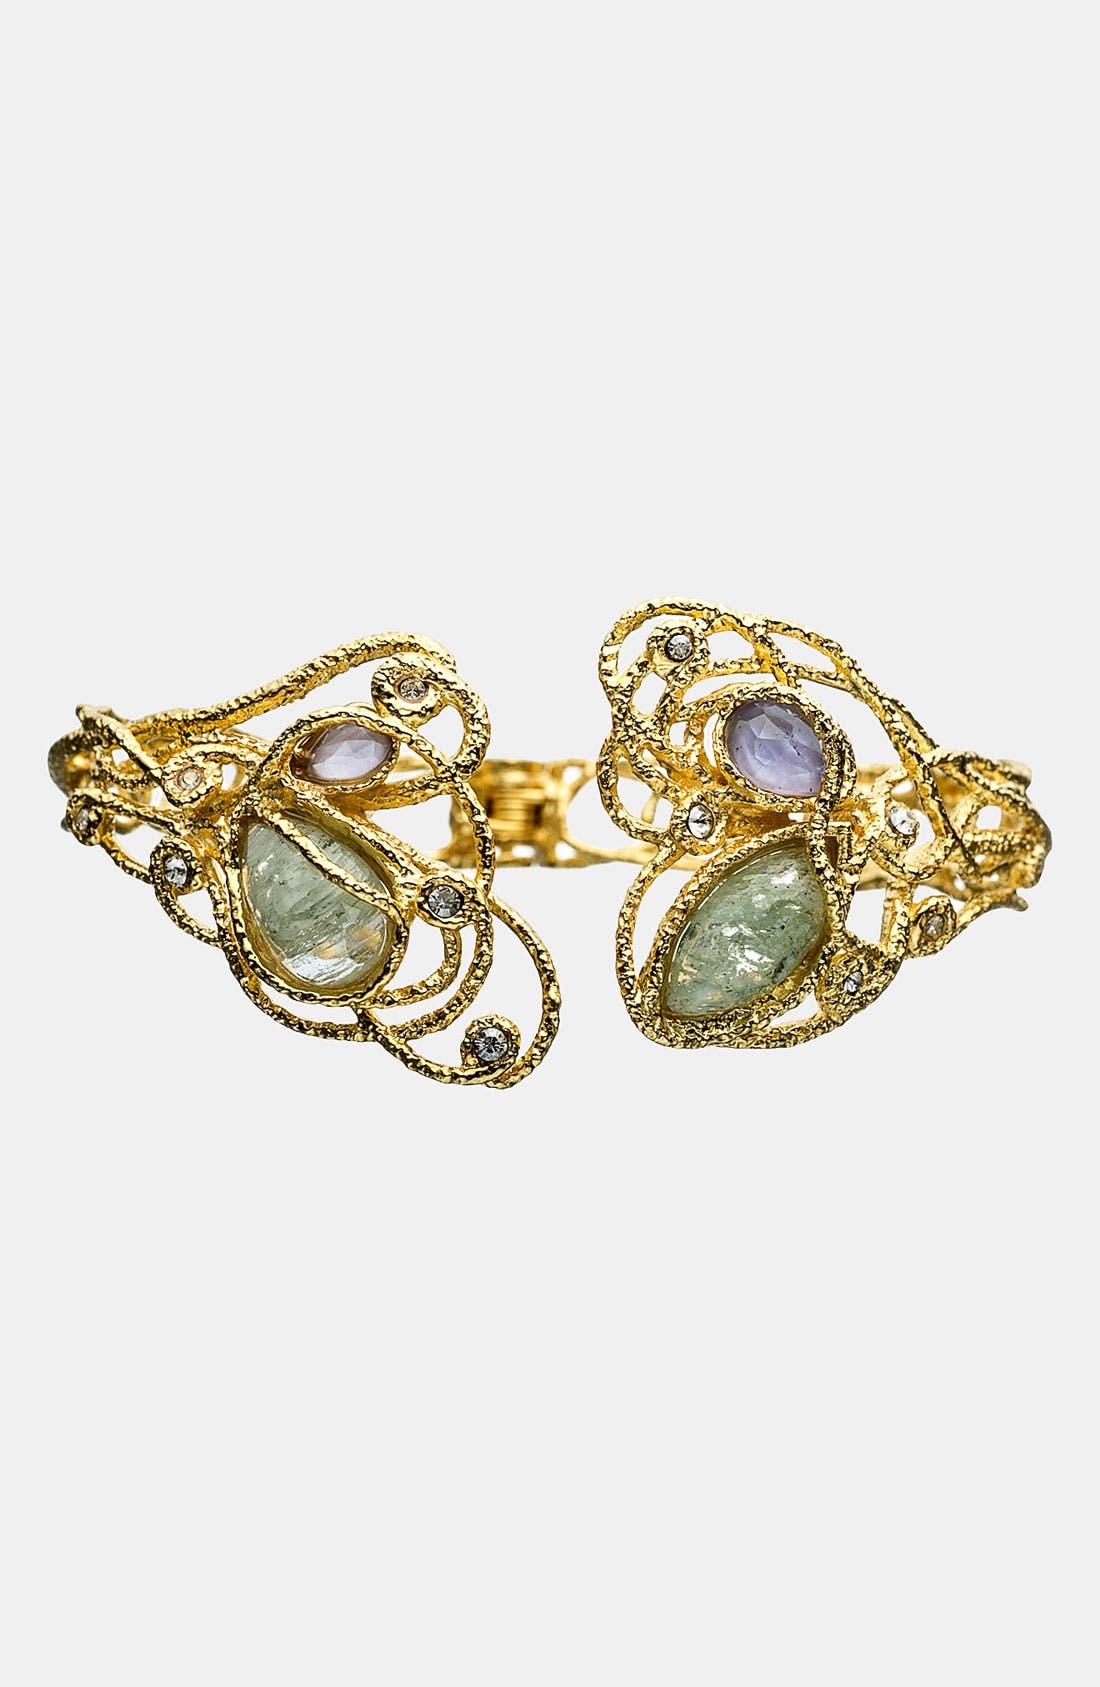 Main Image - Alexis Bittar 'Elements - Mauritius' Bracelet